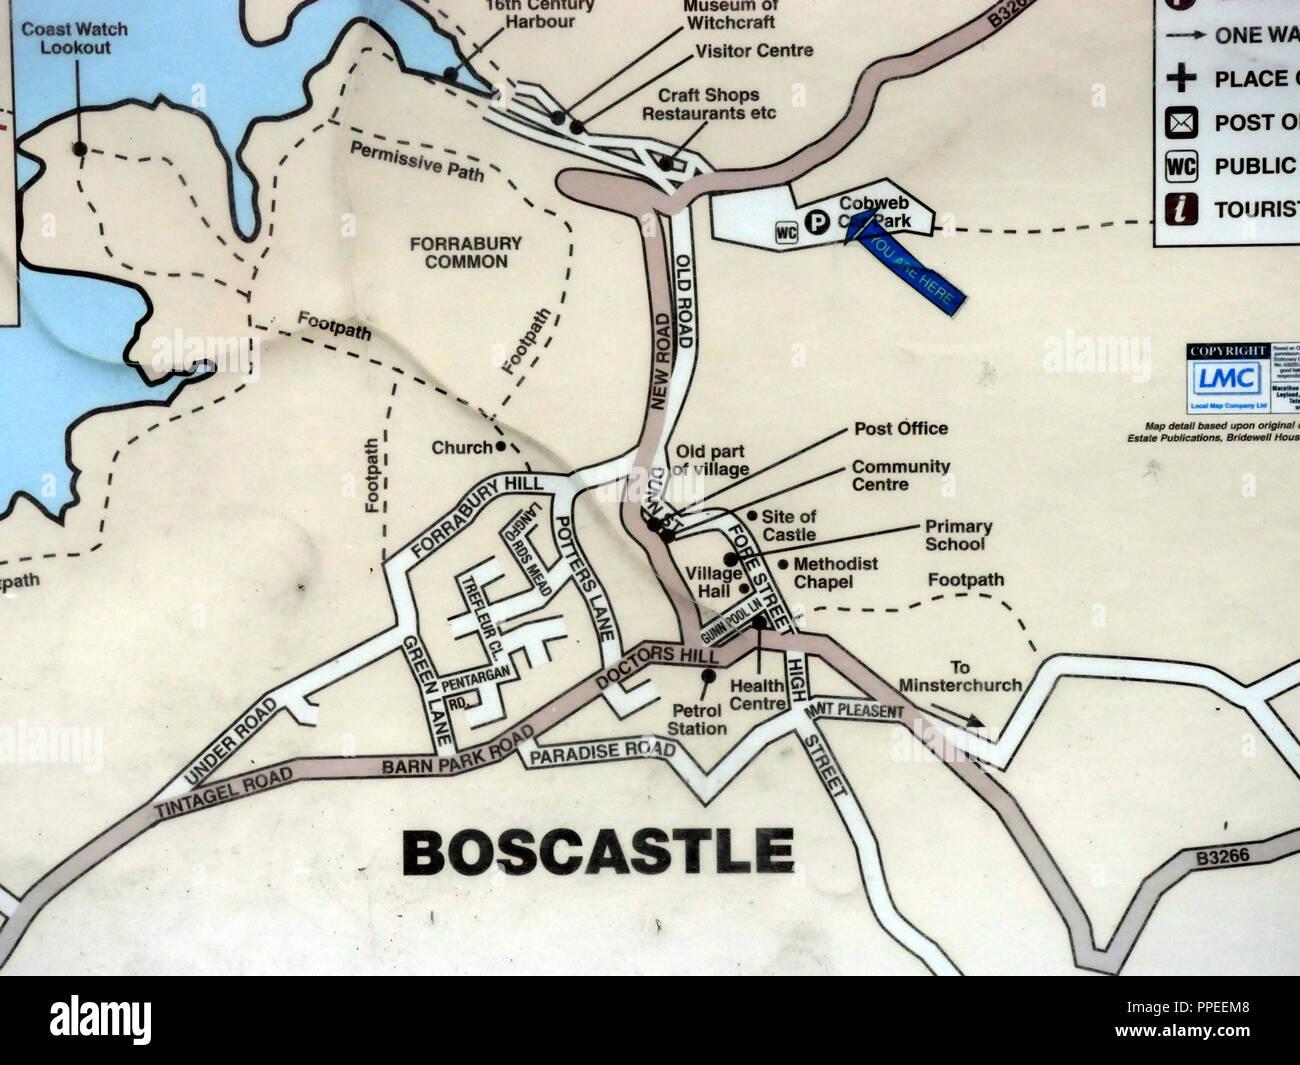 Map Of Boscastle Map of Boscastle Stock Photo: 220365720   Alamy